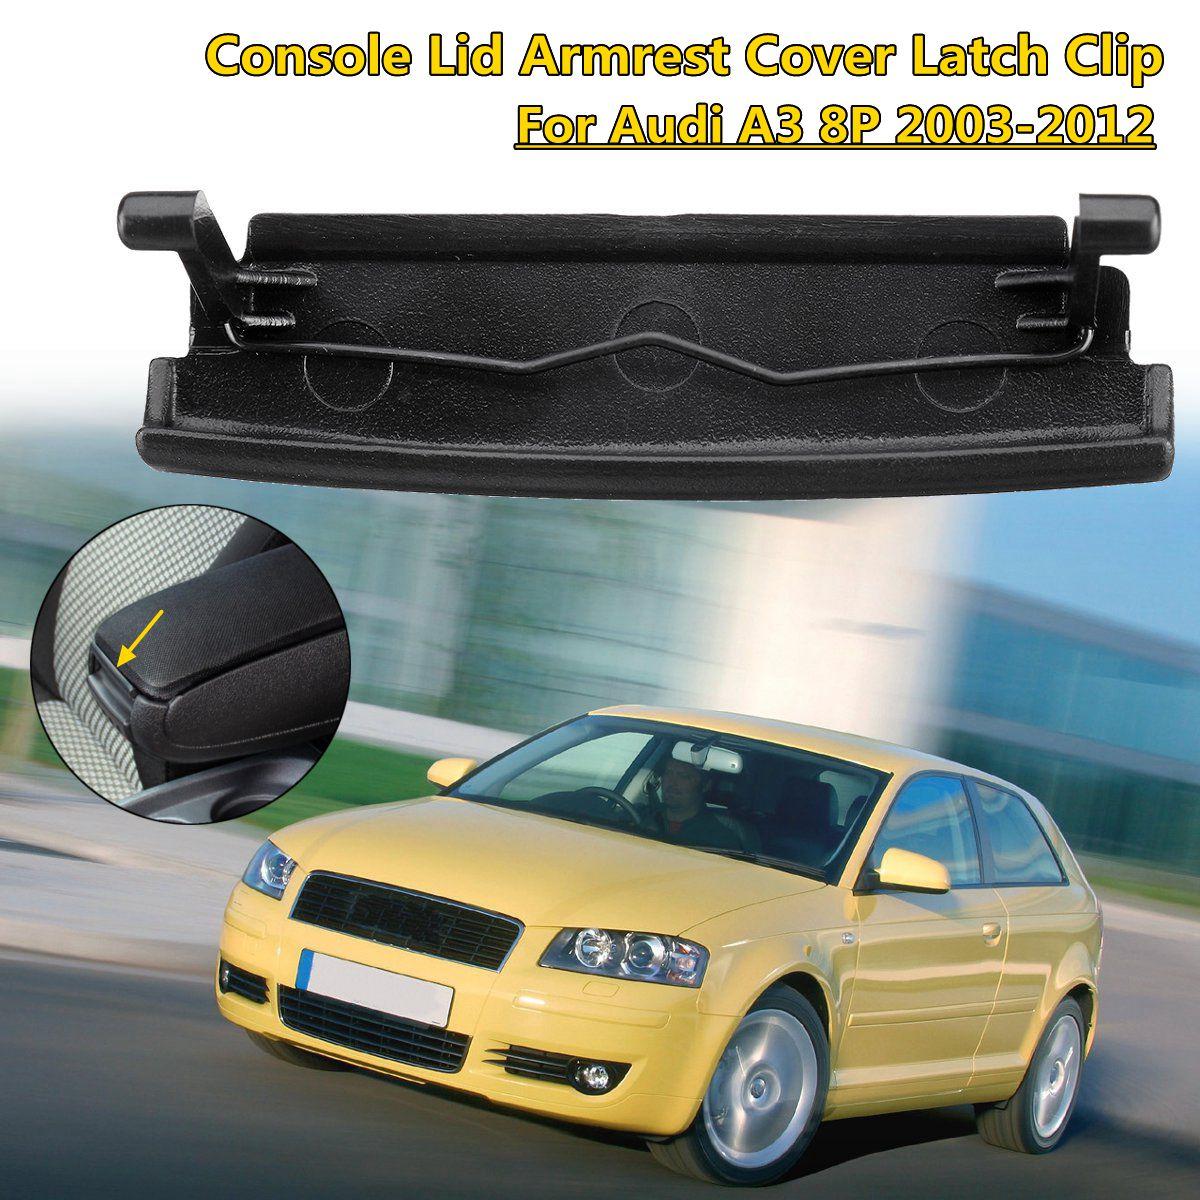 New Car Armrest Center Console Lid Cover Latch Clip Plastic For Audi A3 8P 03-12